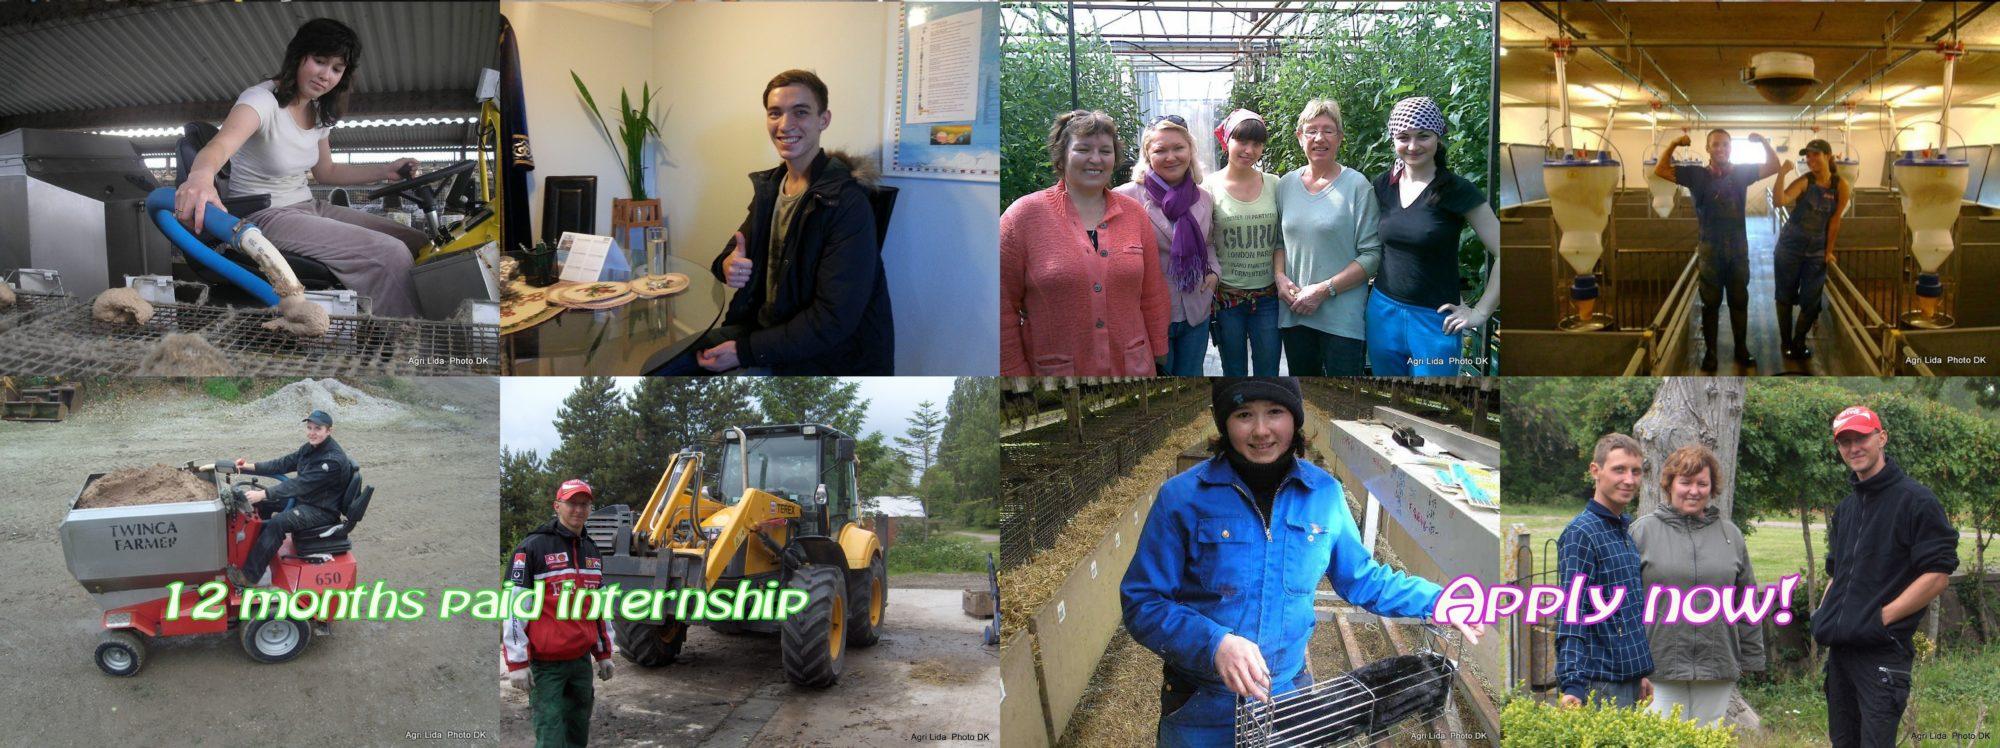 Agri LIDA Agriculture Internships in Denmark.